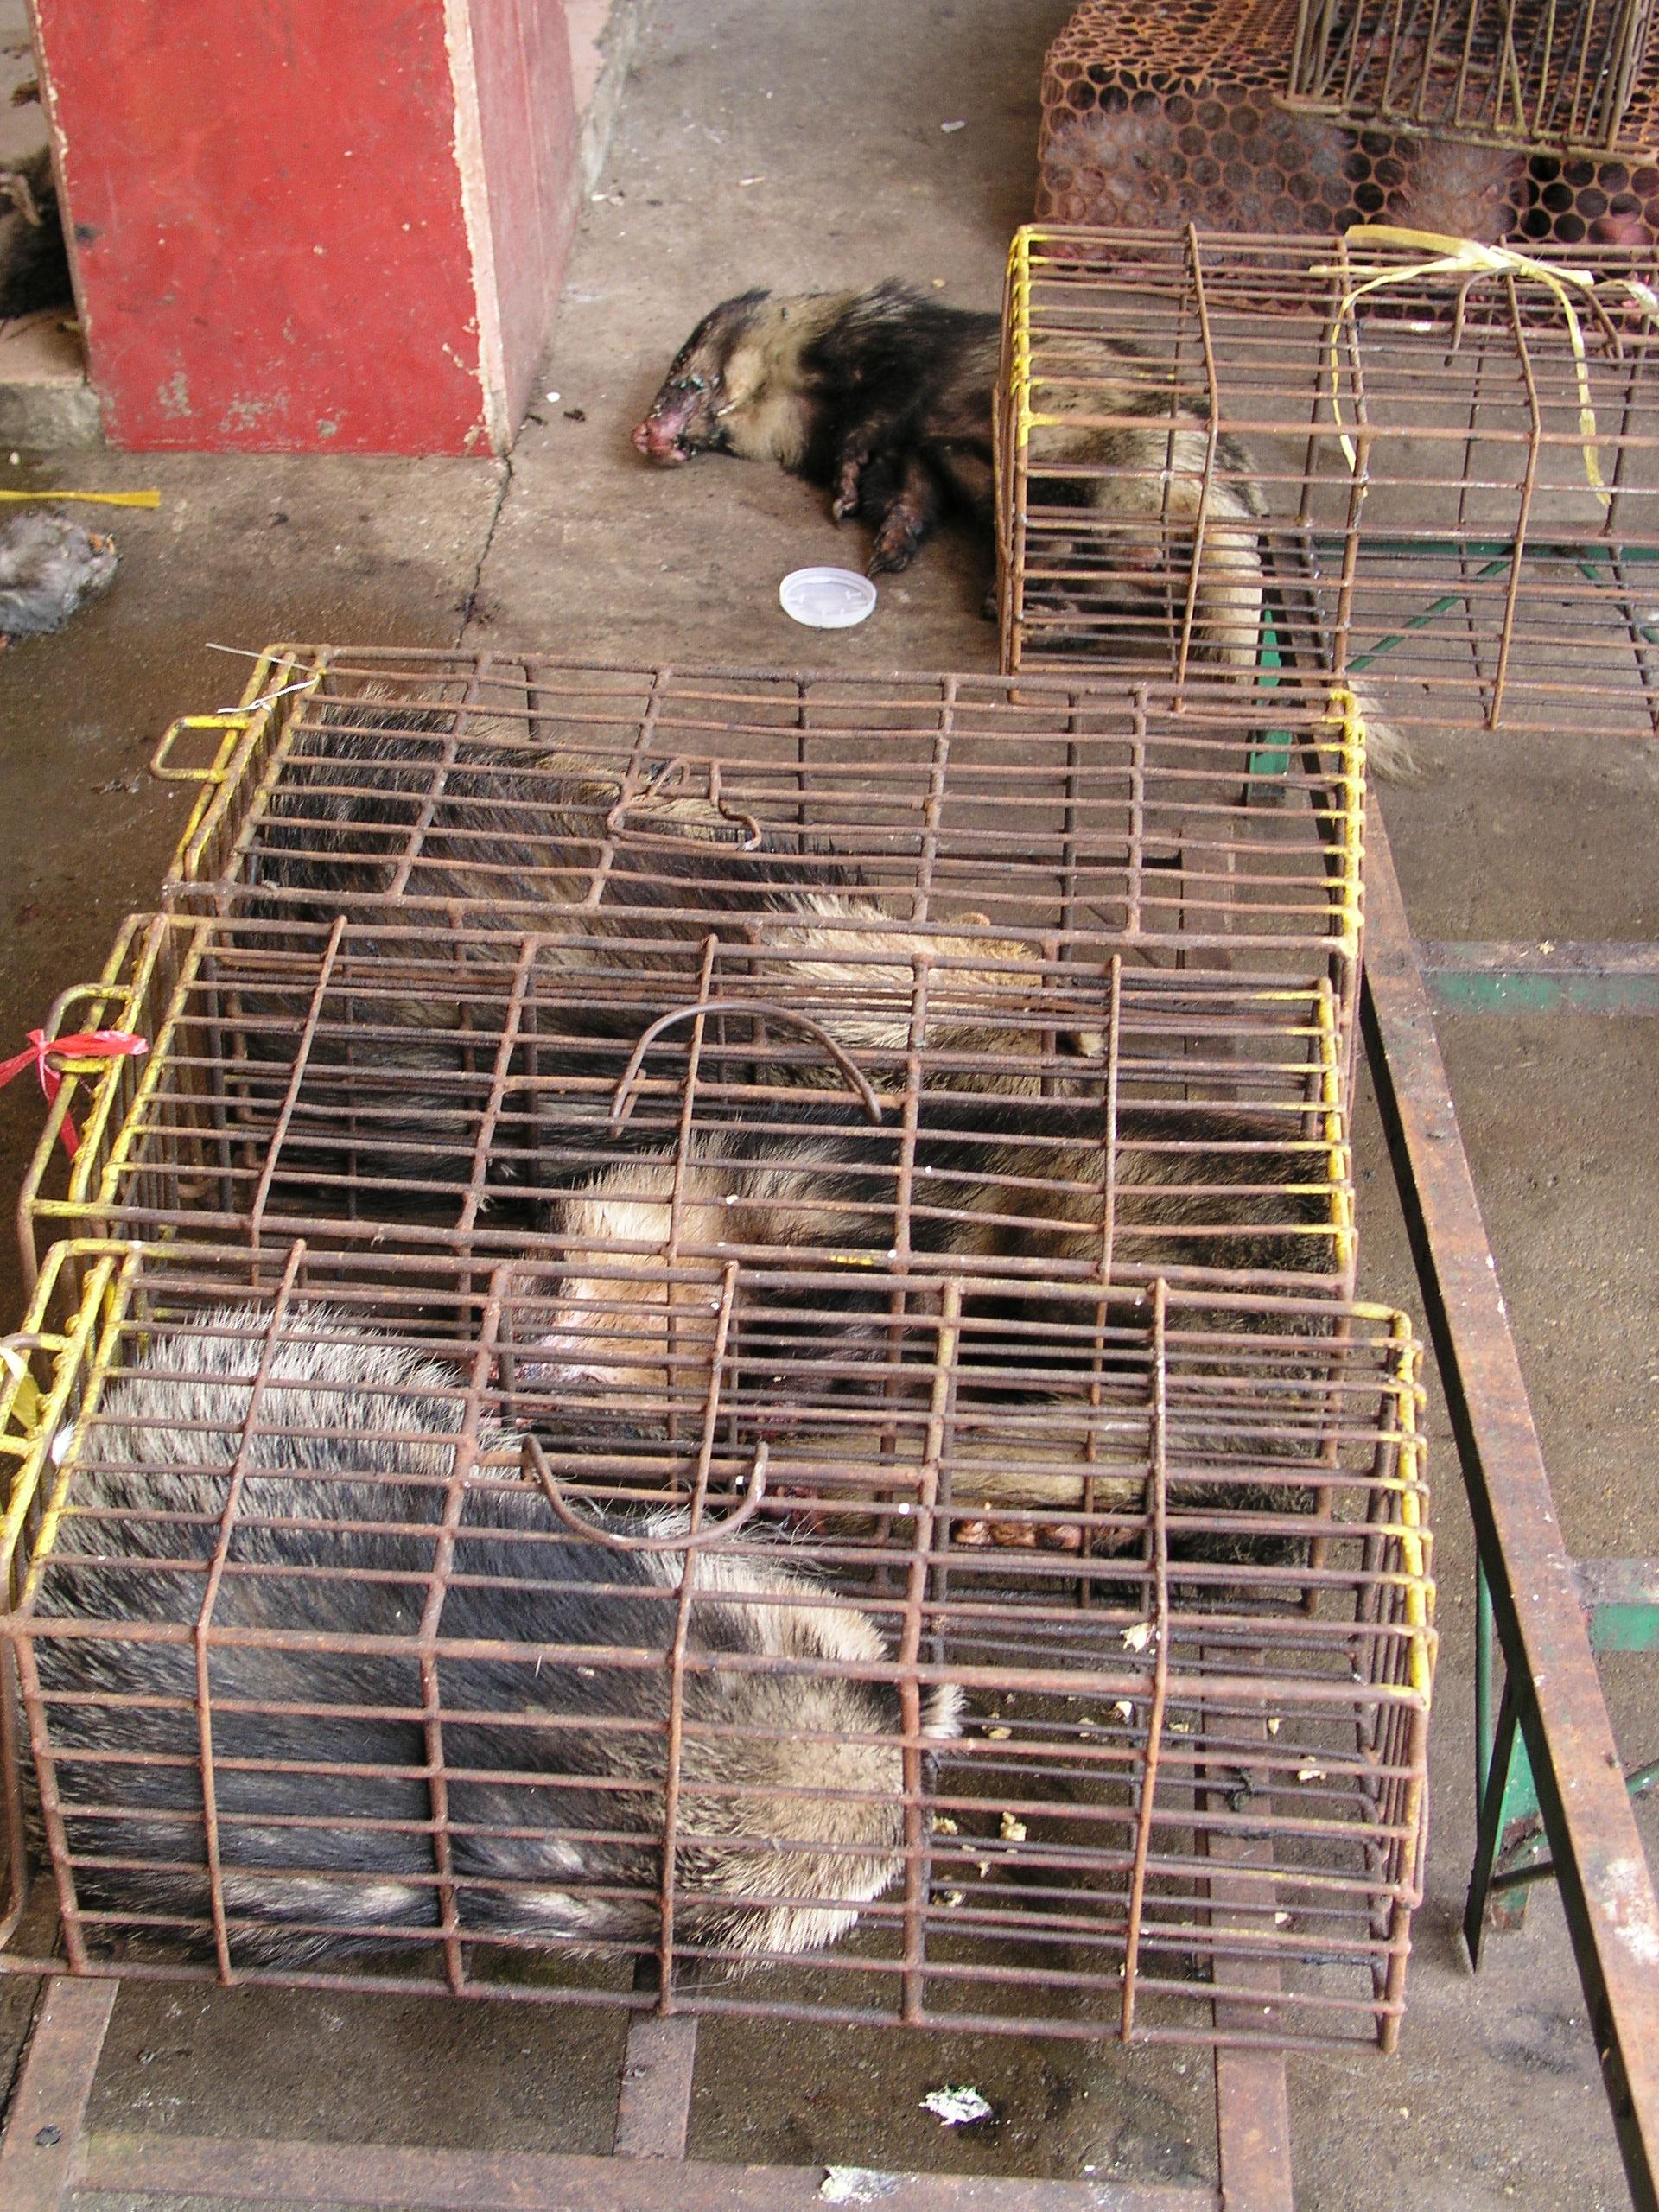 Chau Tau Market in Guangzhou where the SARS epidemic started from live civets .3.JPG